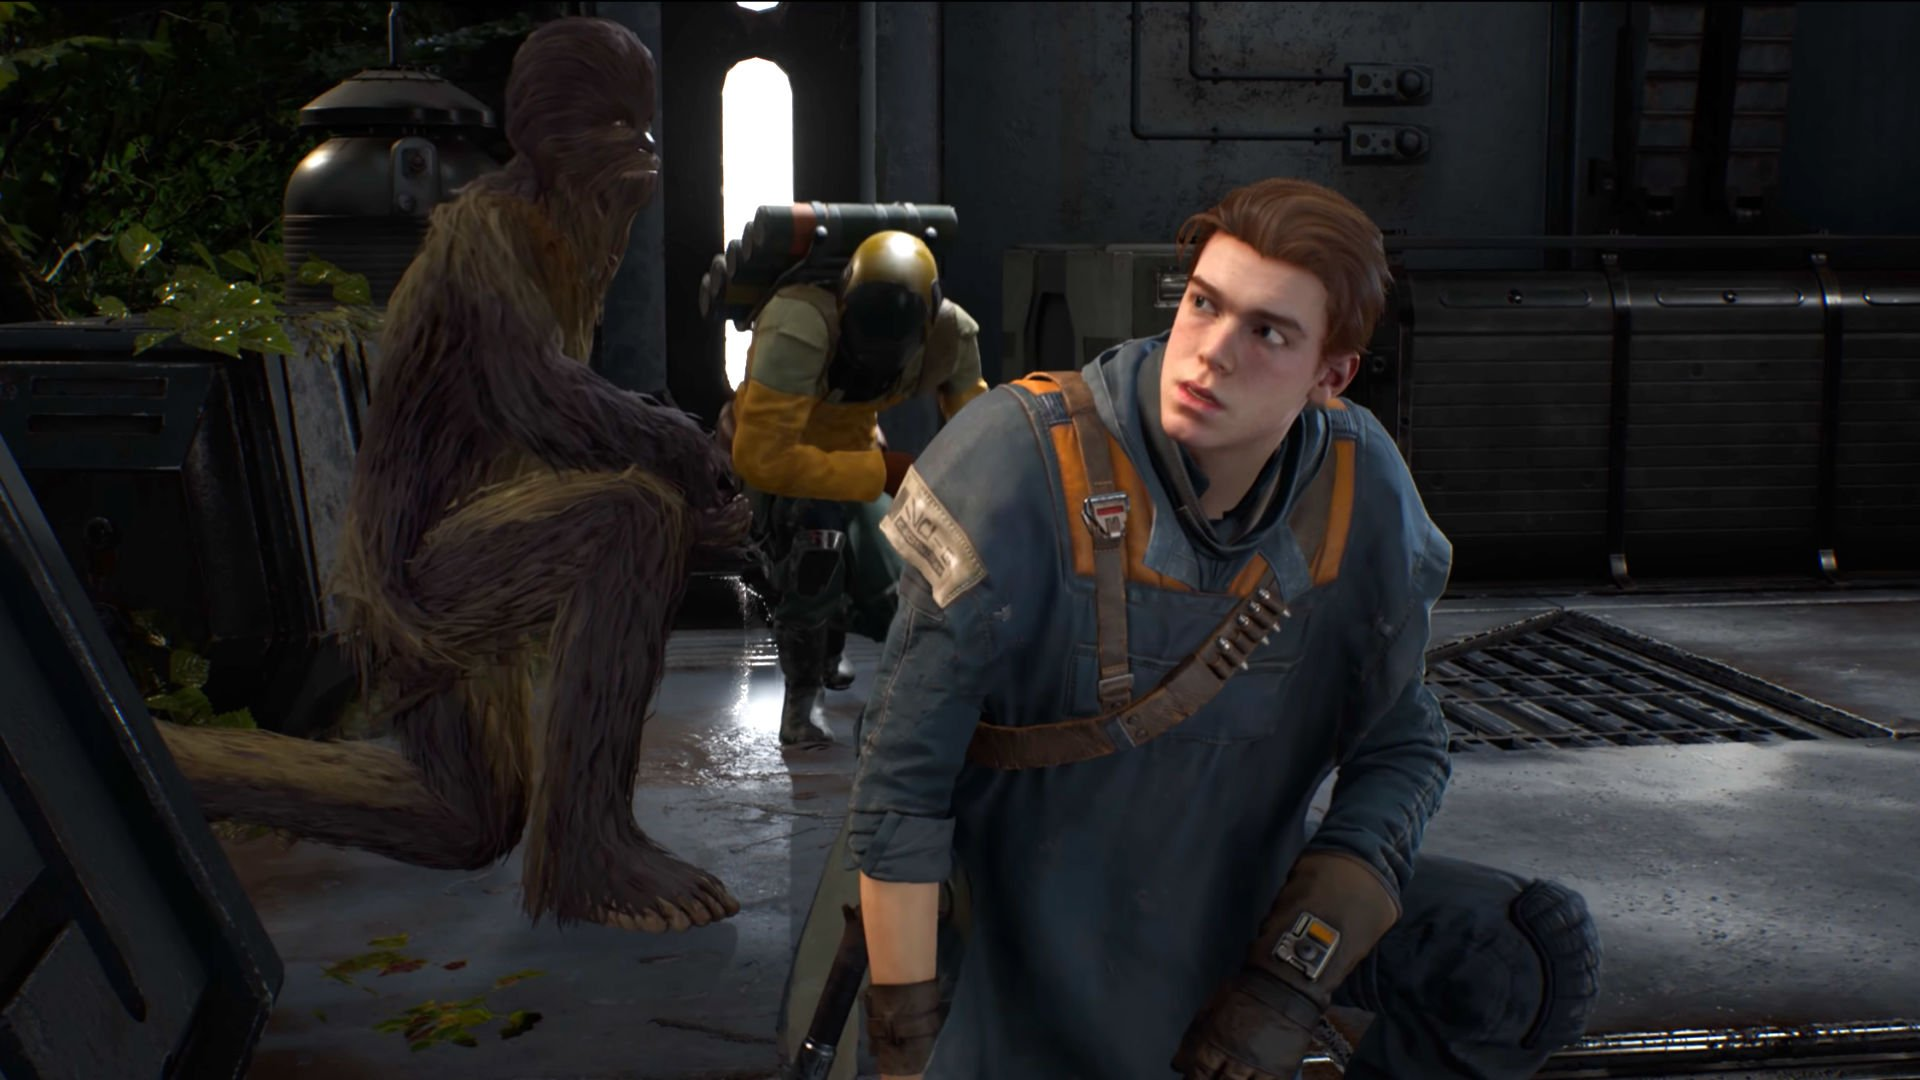 Star Wars Jedi: Fallen Order force skill tree has no Dark Side